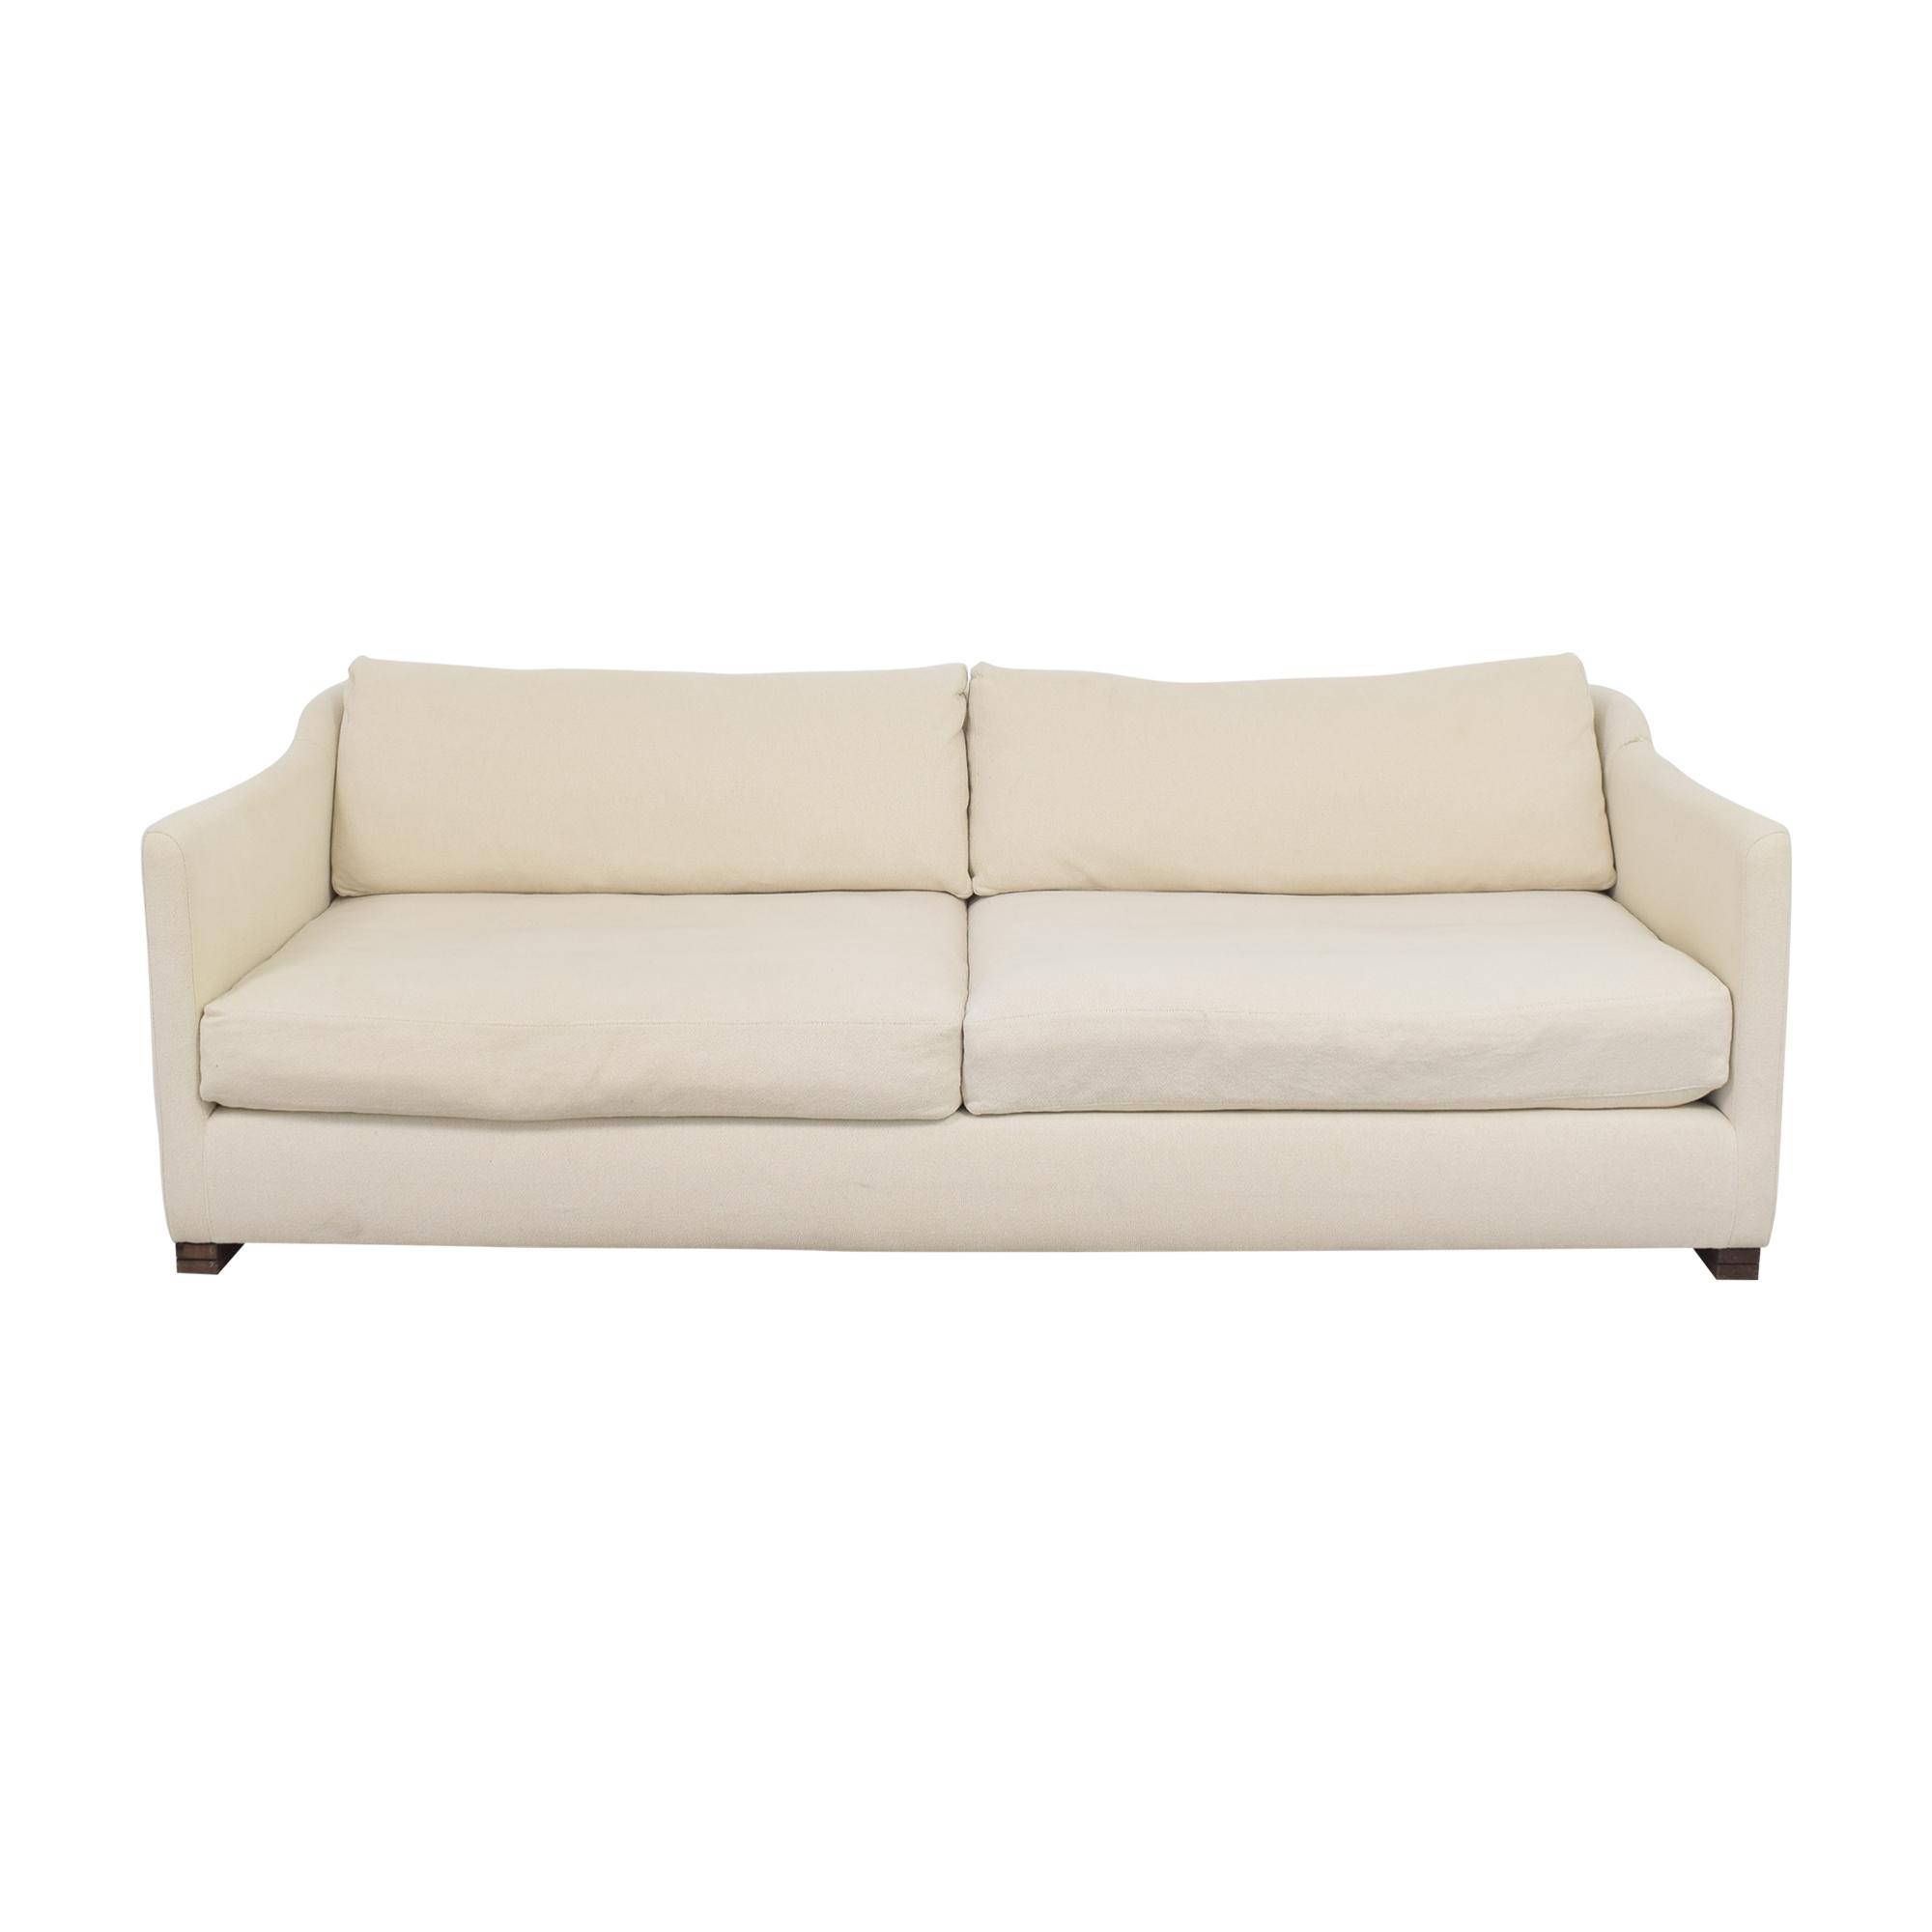 Cisco Brothers Dexter Wide Sofa / Sofas